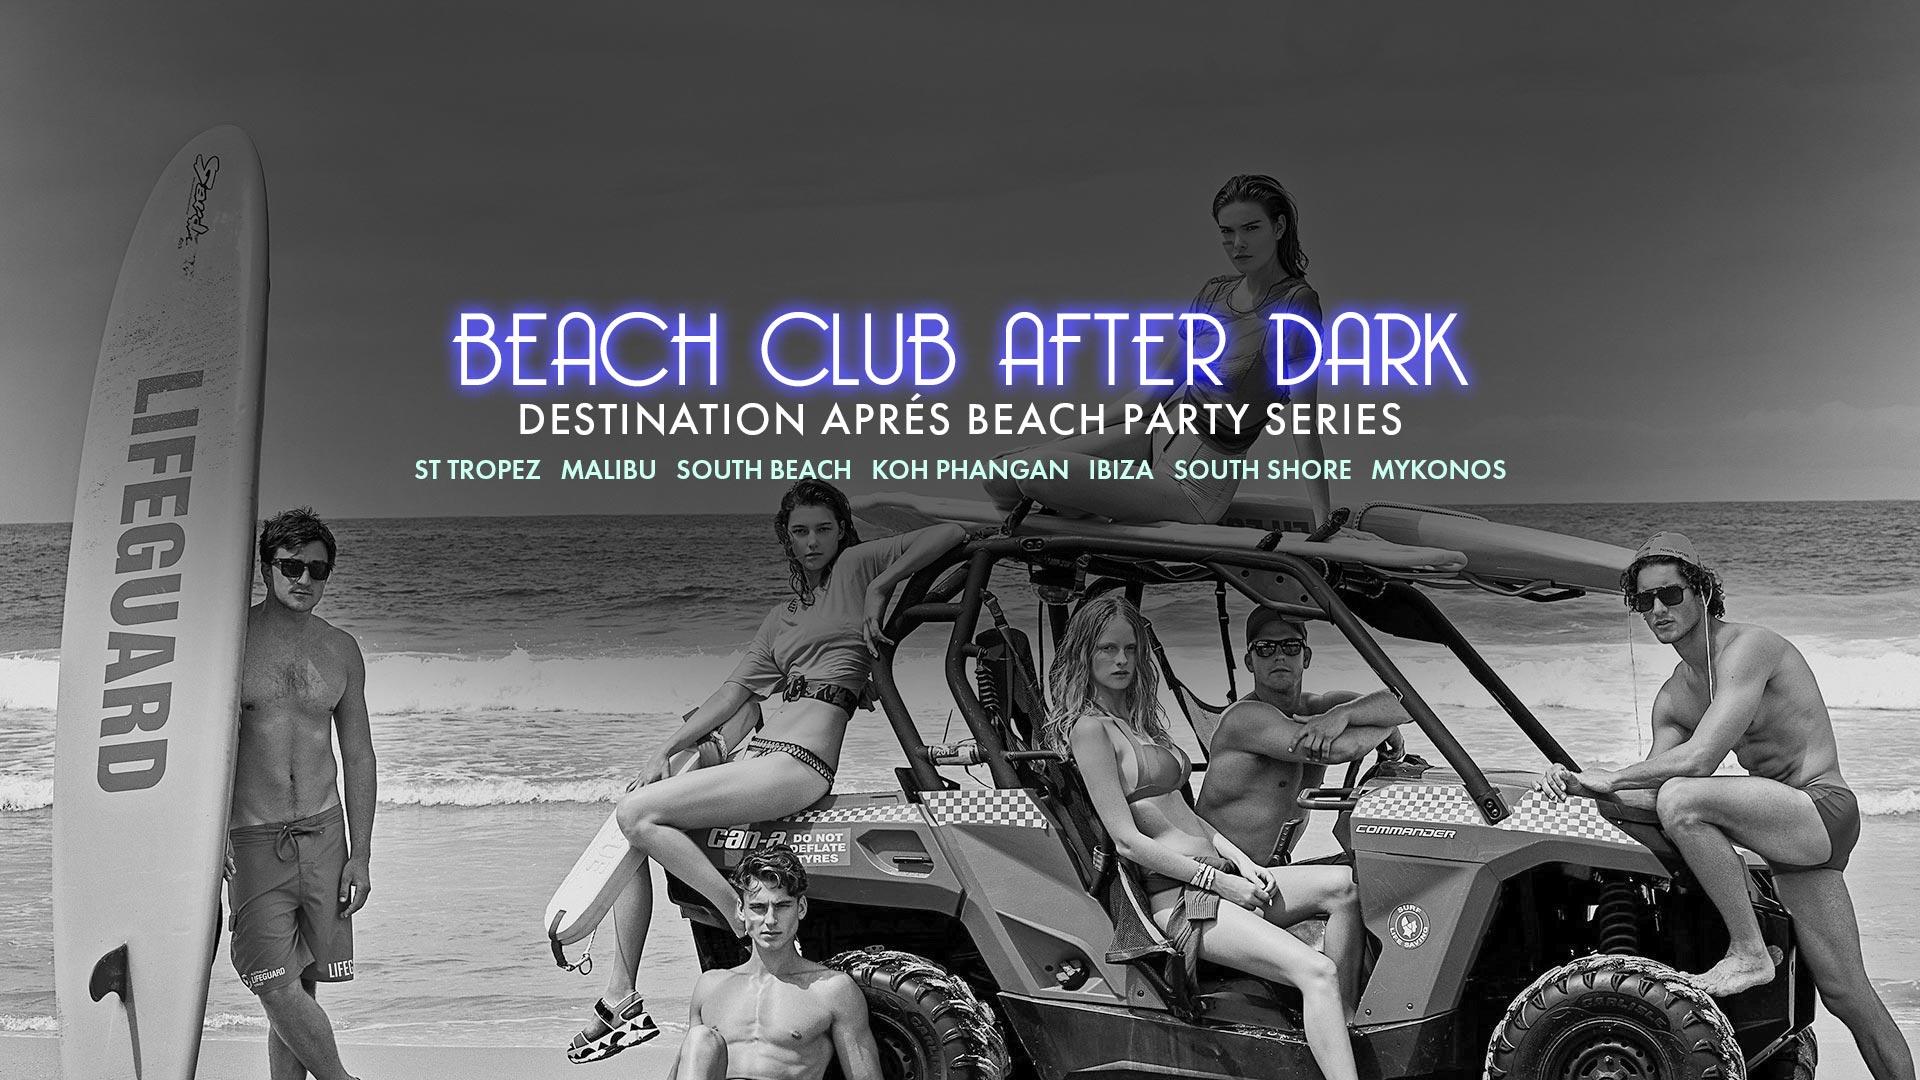 Beach Club After Dark The Fifth Social Club Party Malibu The Fifth